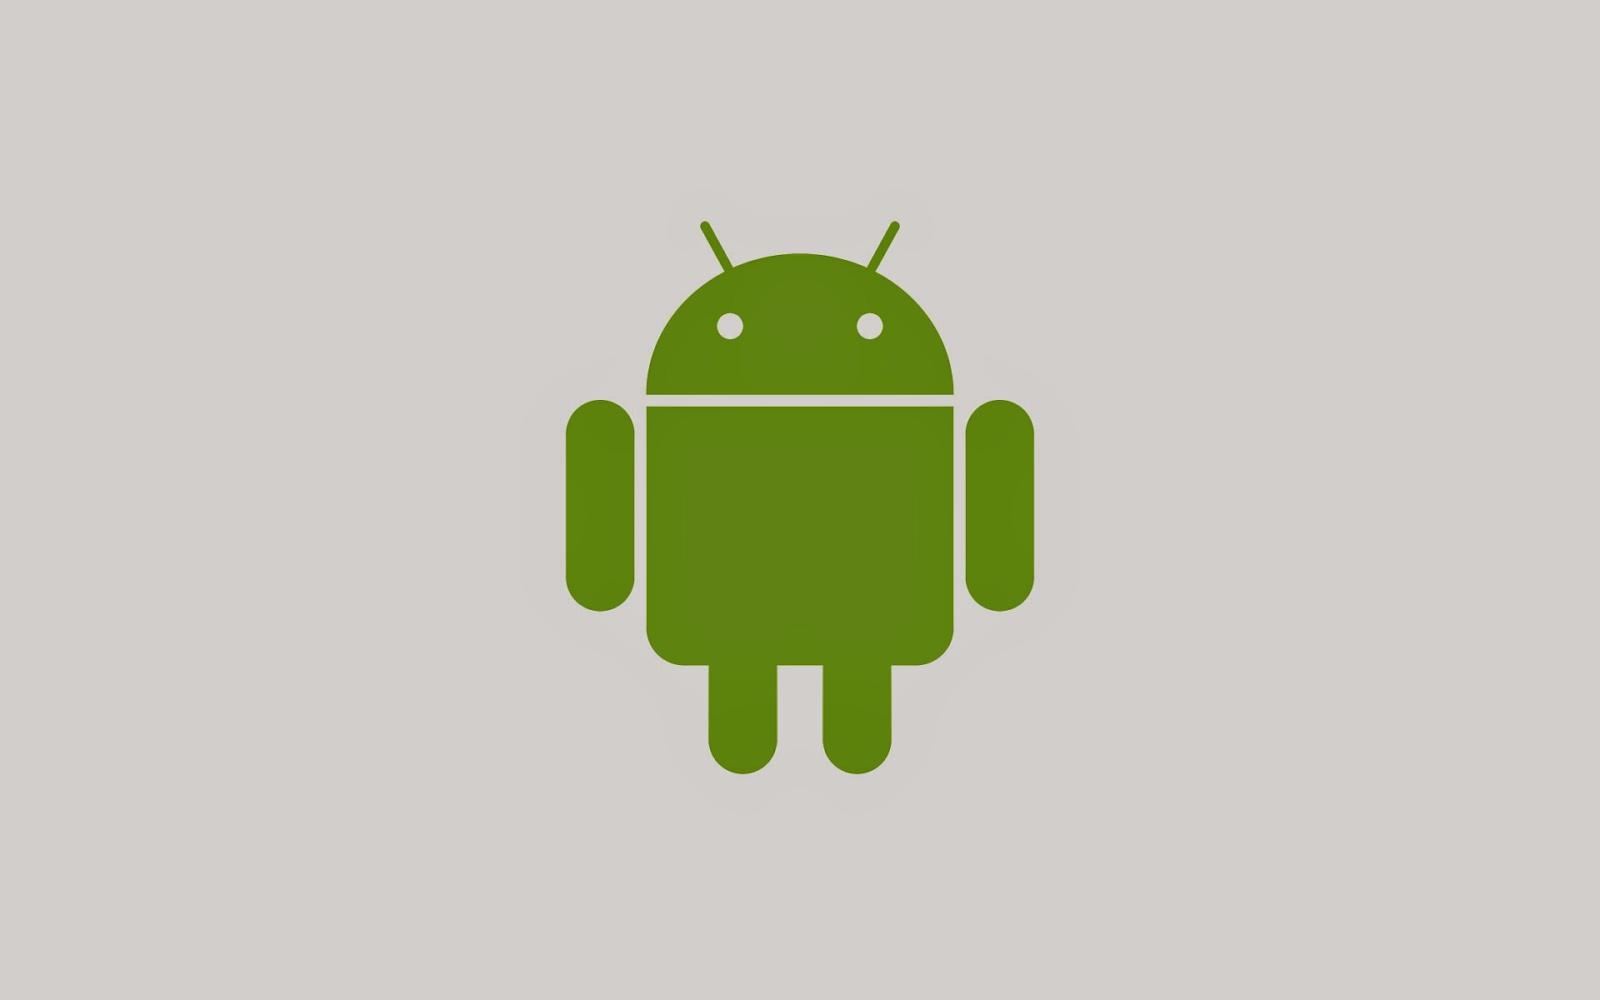 Wallpapers De Android Wallpapers De Excelente Calidad